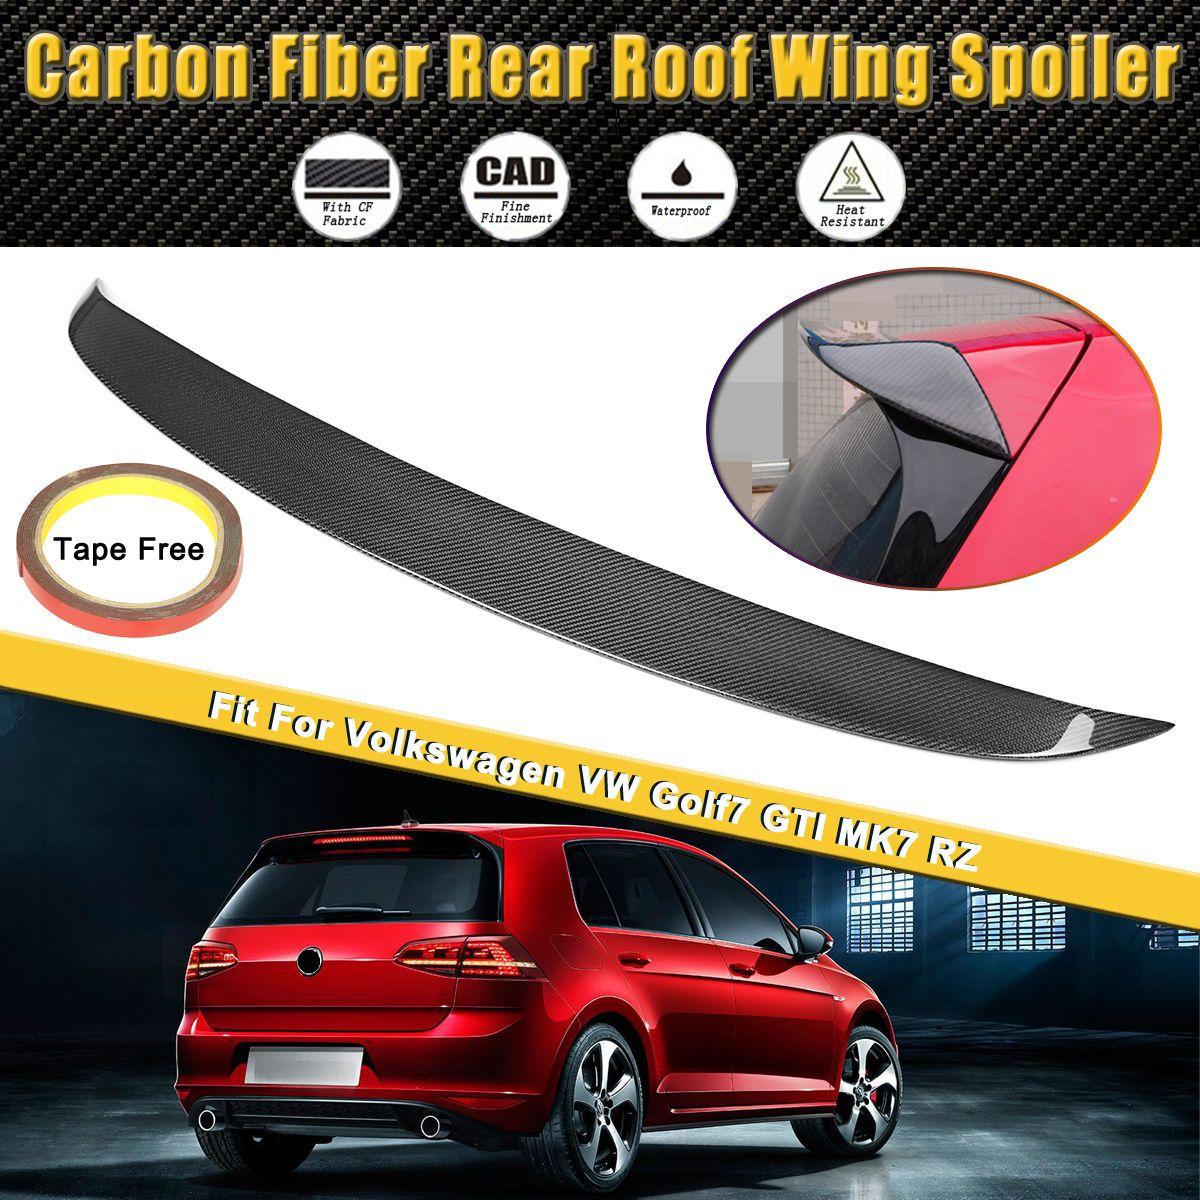 Full Real Carbon Fiber Spoiler Rear Roof Wing Spoiler Lip Fit For Volkswagen for VW Golf7 MK7 GTI 2014-2017 Car Styling